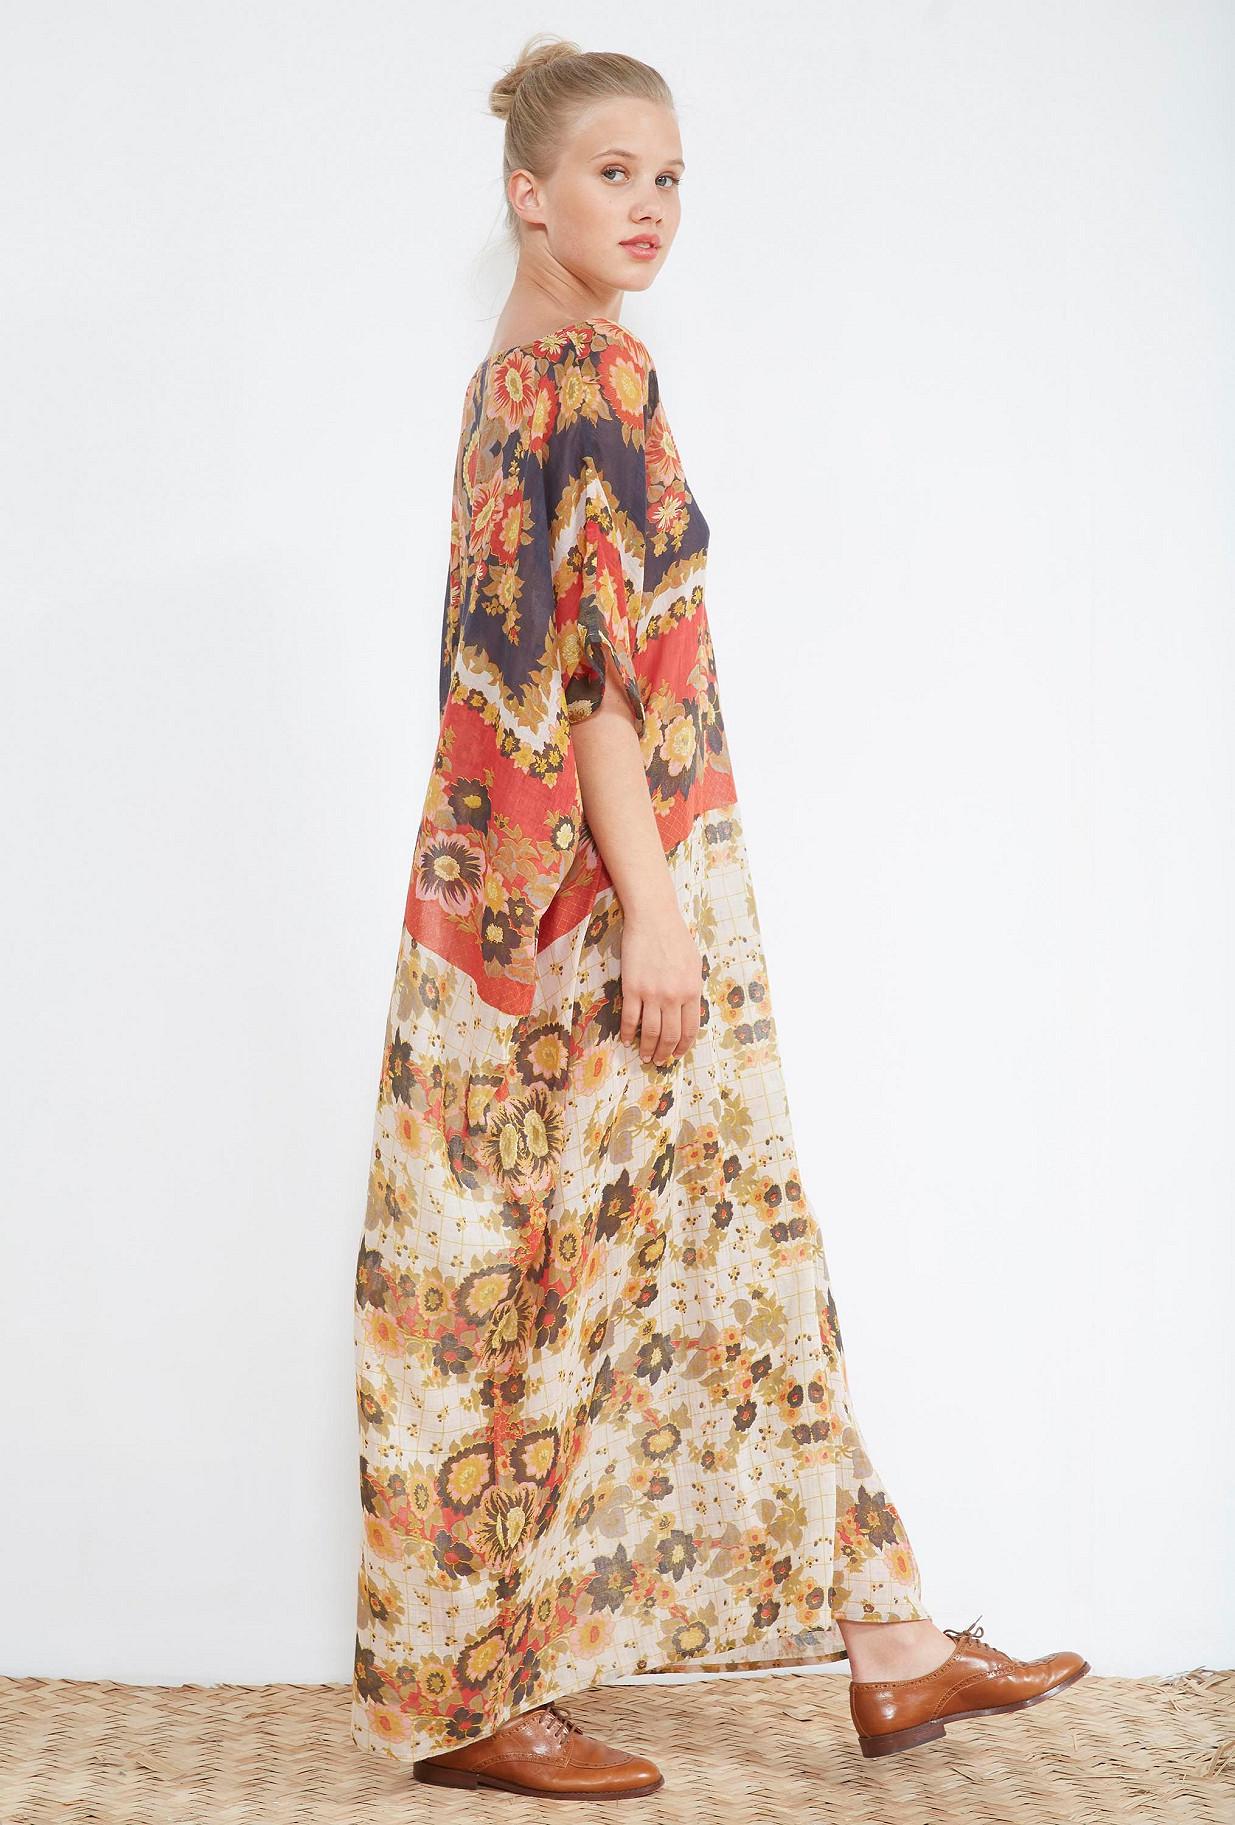 clothes store DRESS  Maria french designer fashion Paris